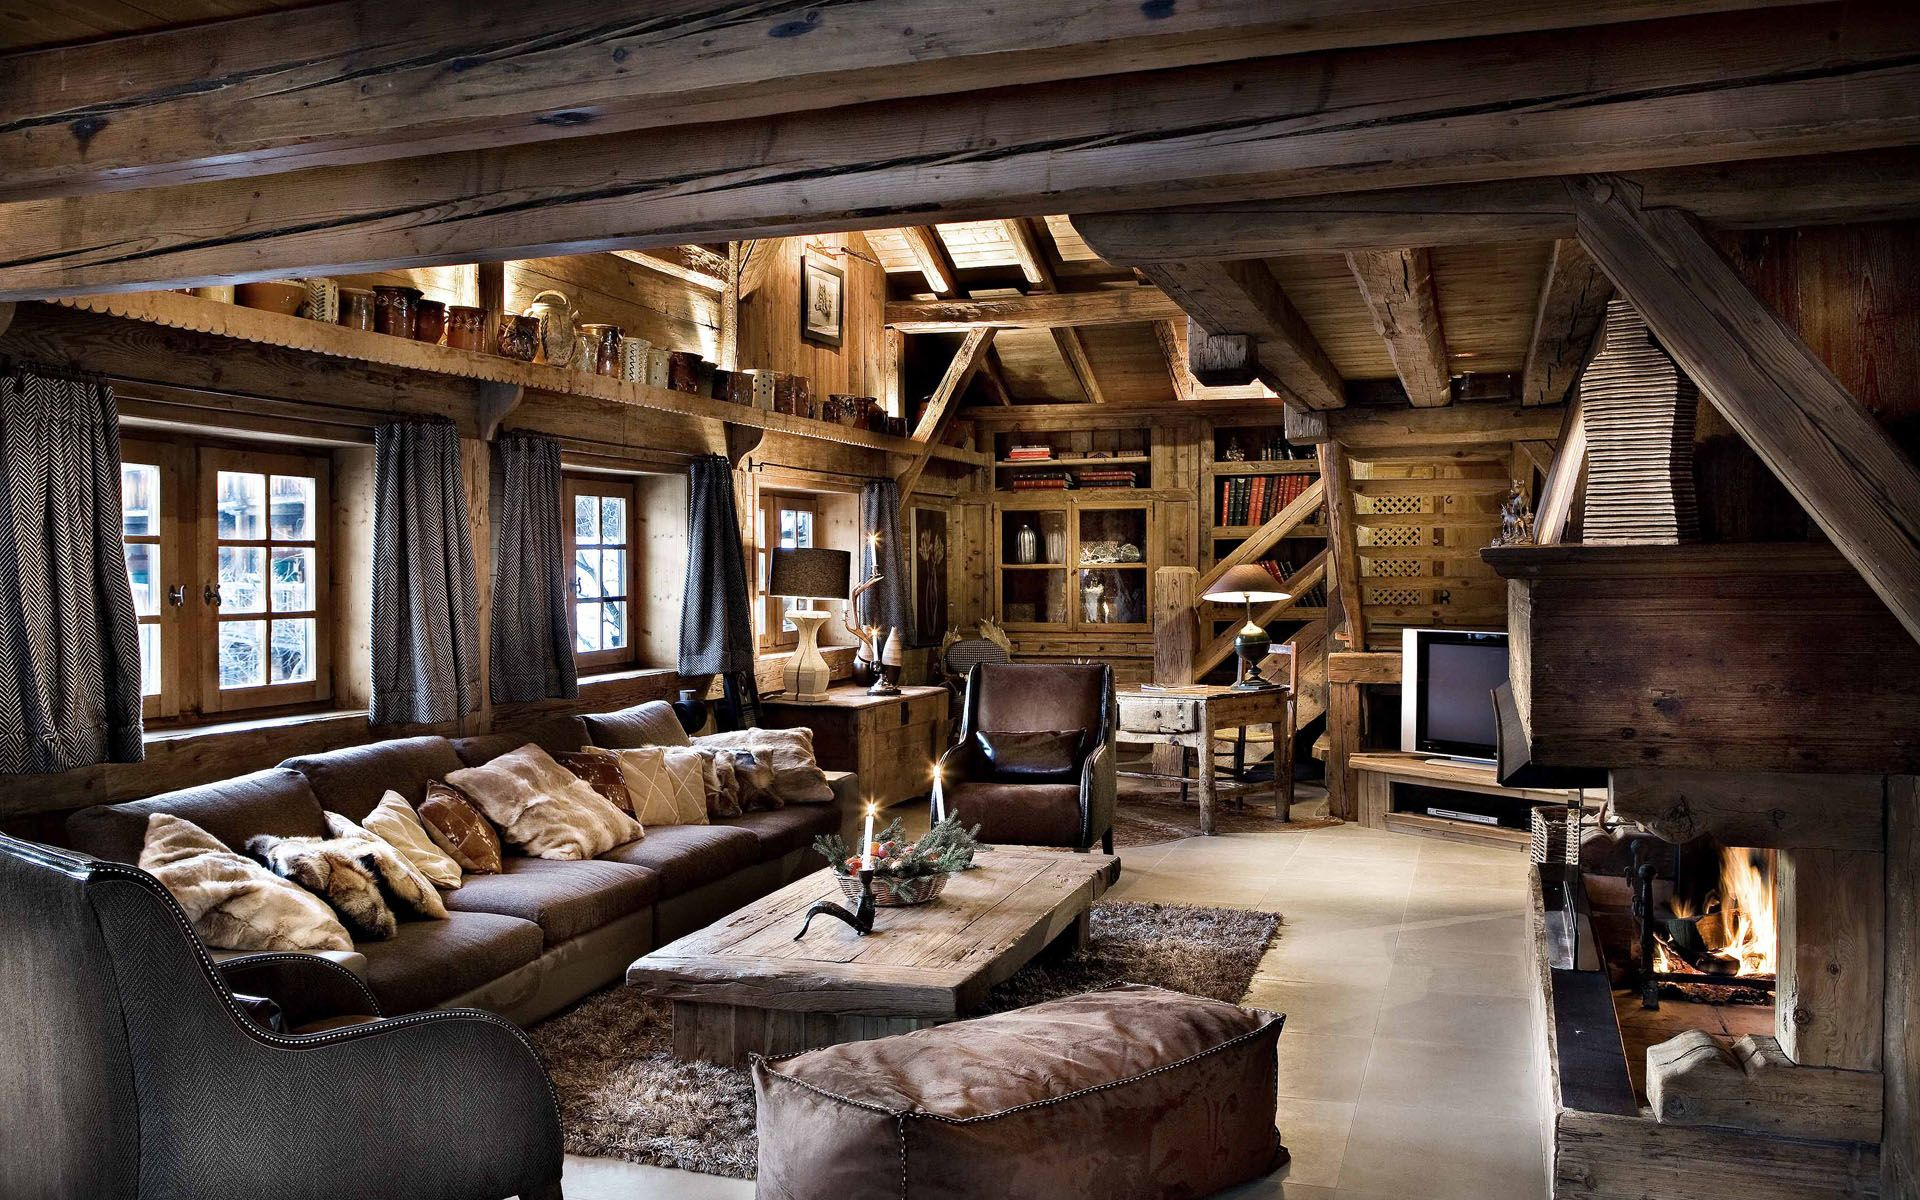 12 photo of 47 for alpine chalet interiors | Mazurska Chata Cottage ...